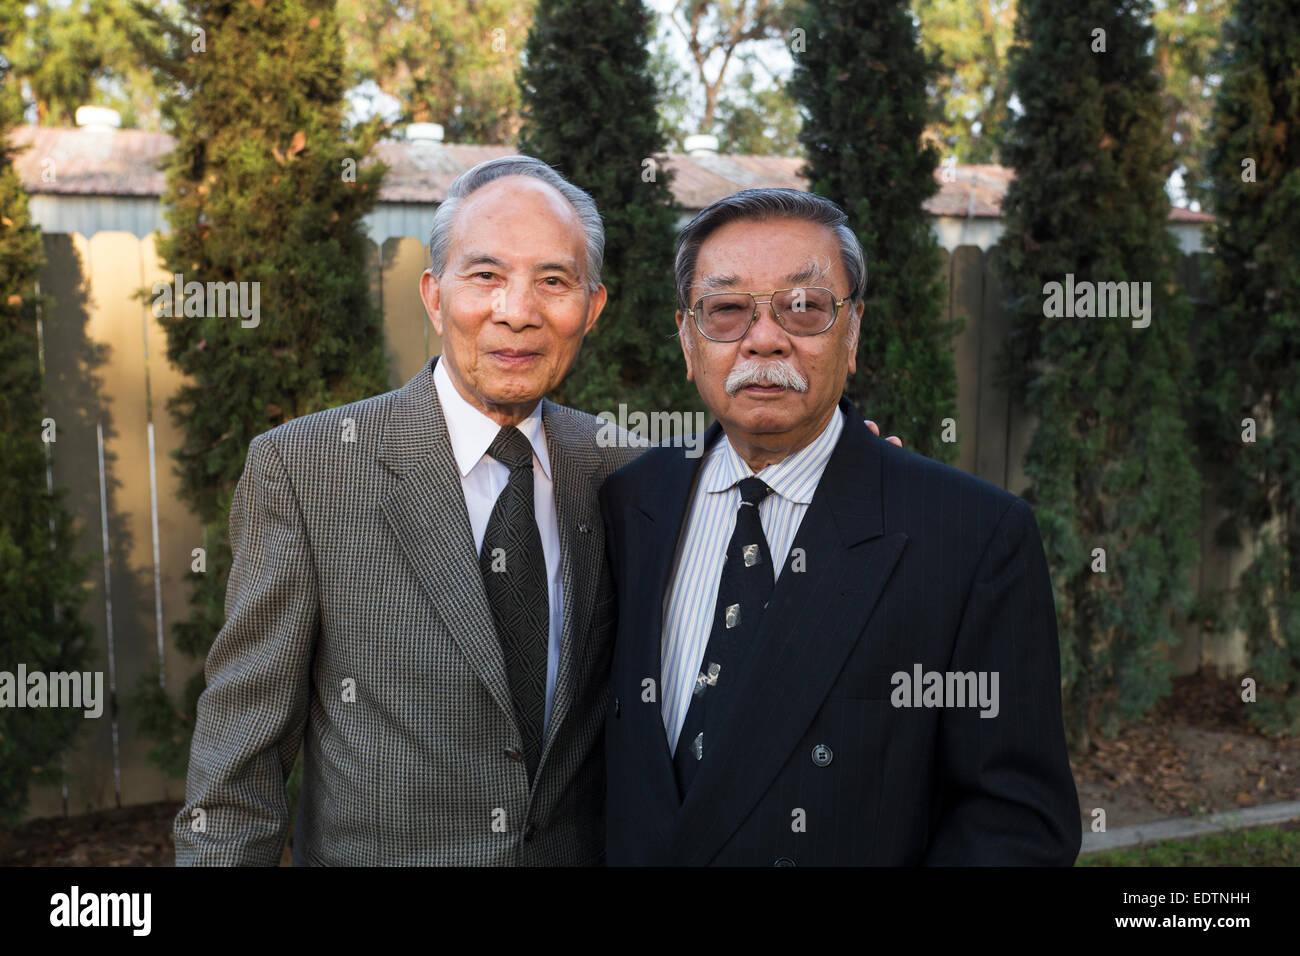 Vietnamese-Americans, friends, Vietnamese funeral, Little Saigon district, Westminster, Orange County, California - Stock Image